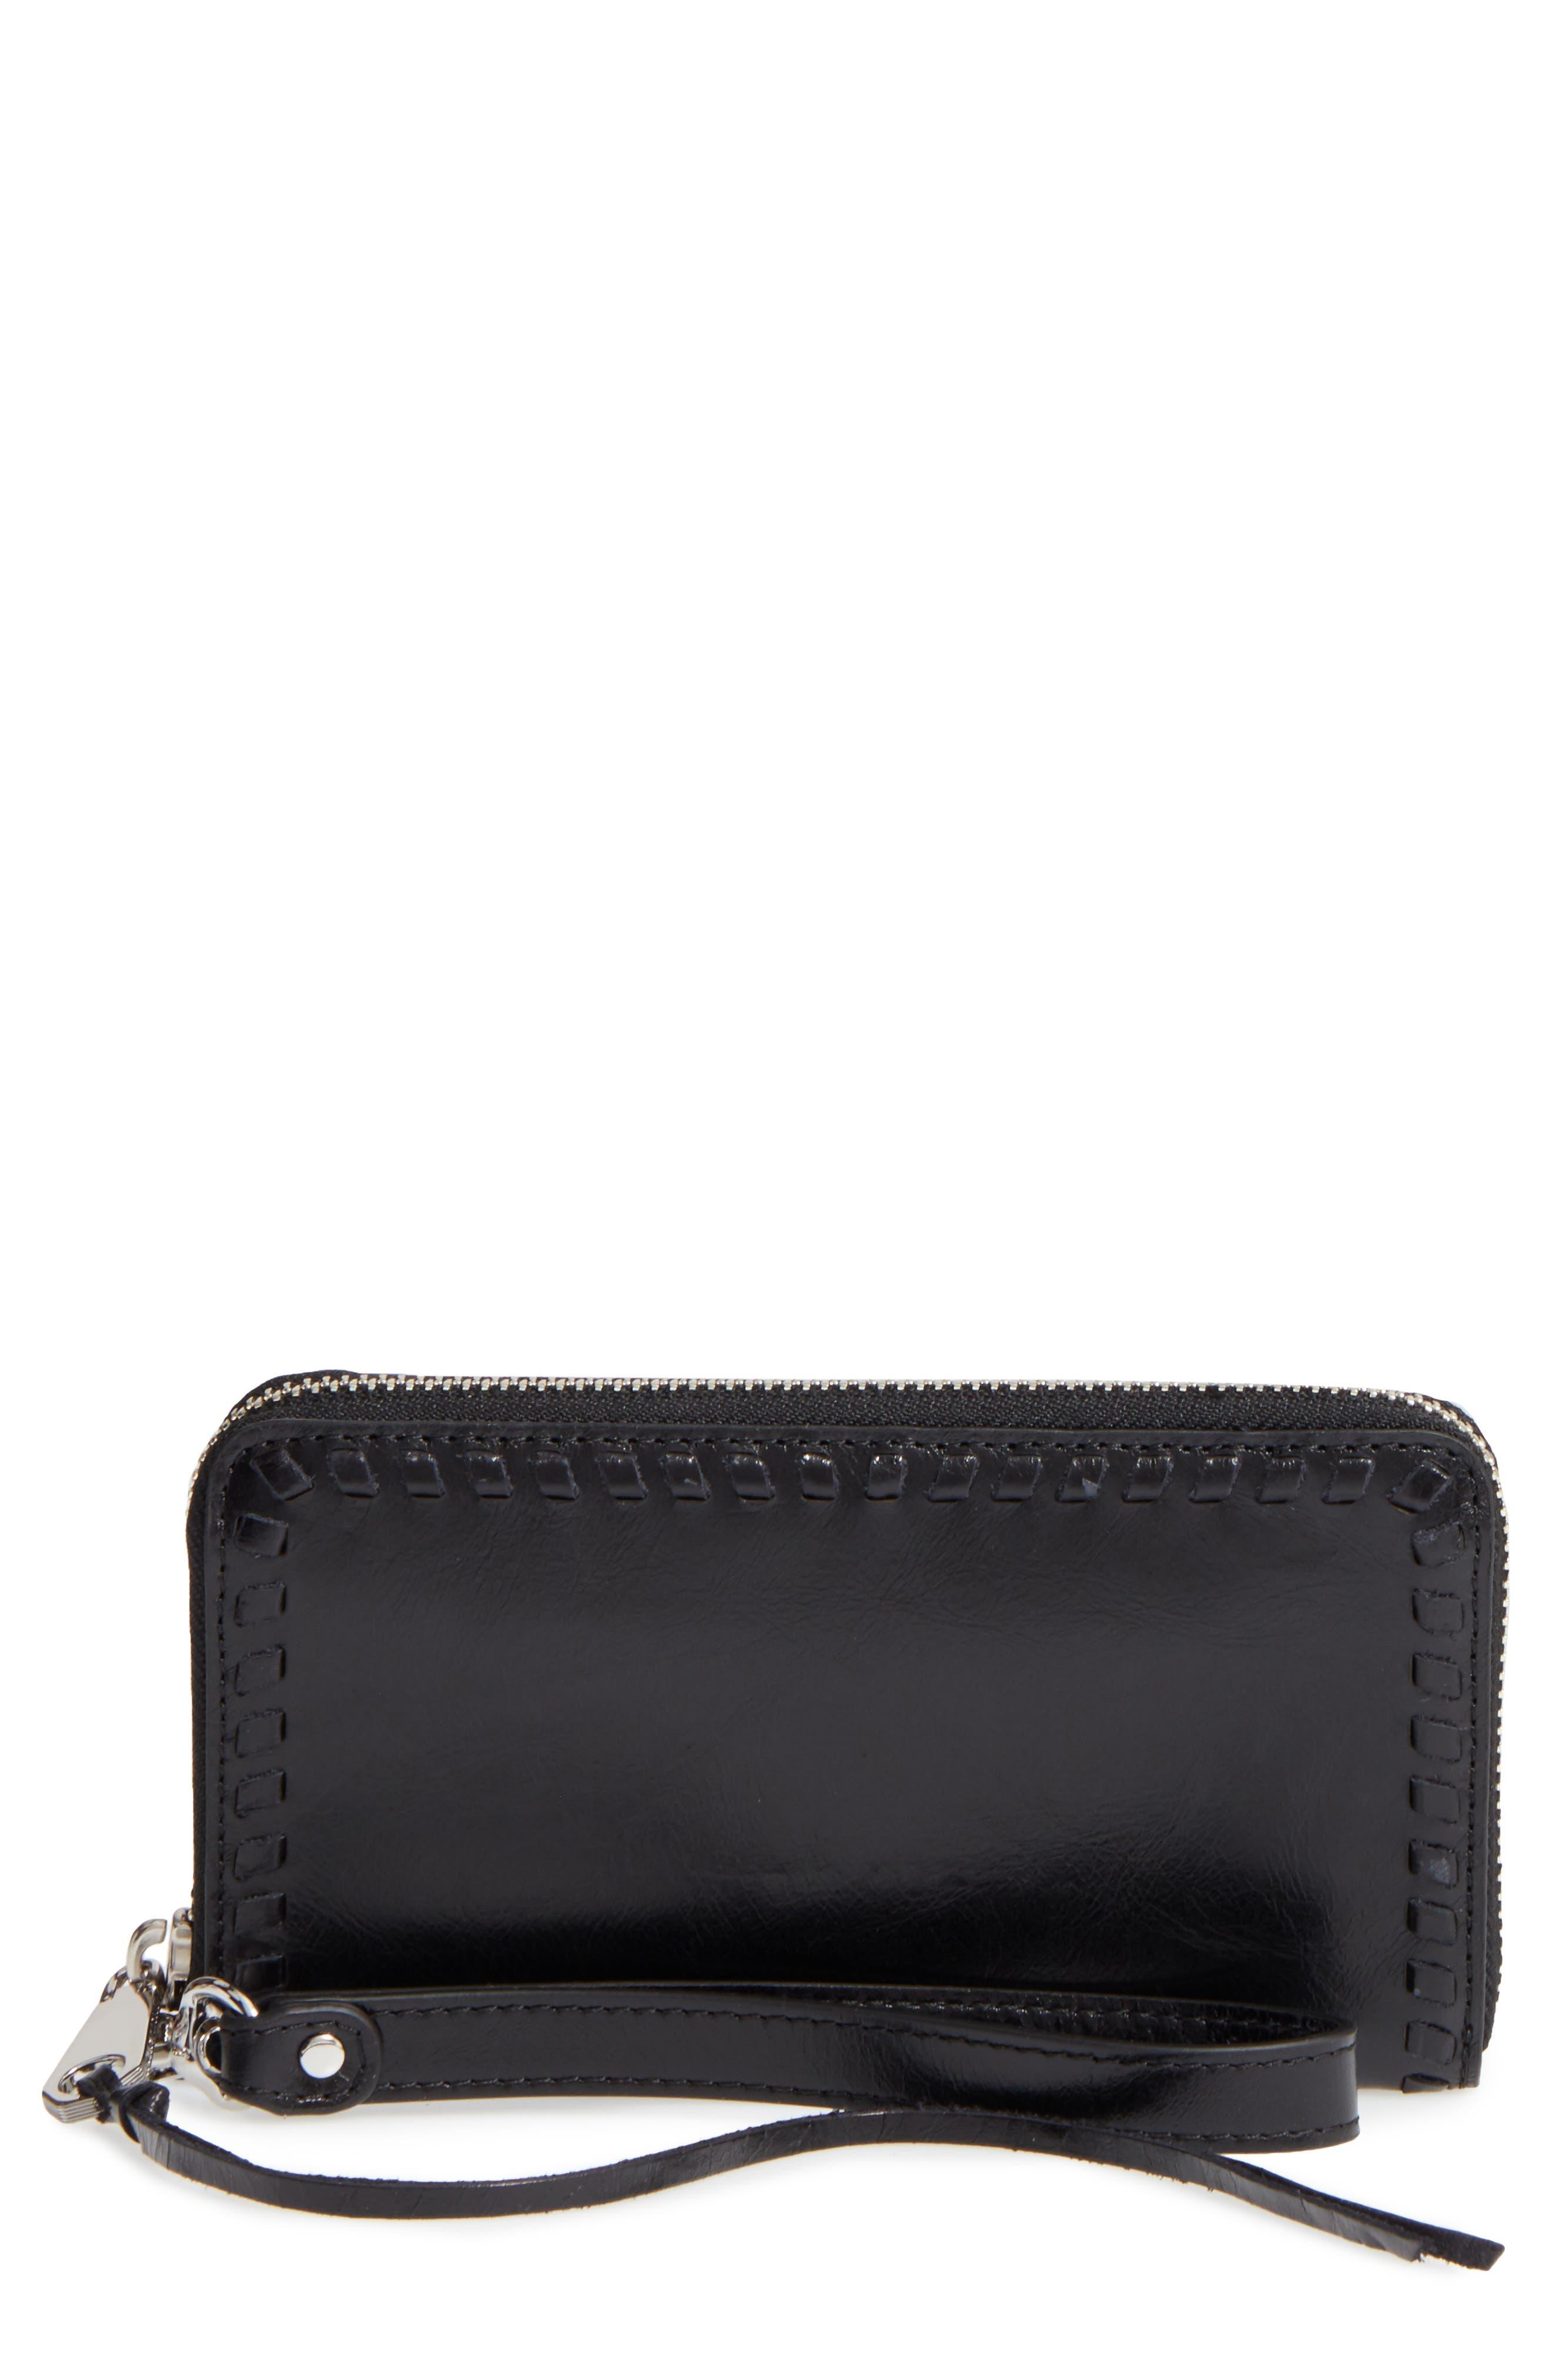 Rebecca Minkoff Vanity Phone Wallet